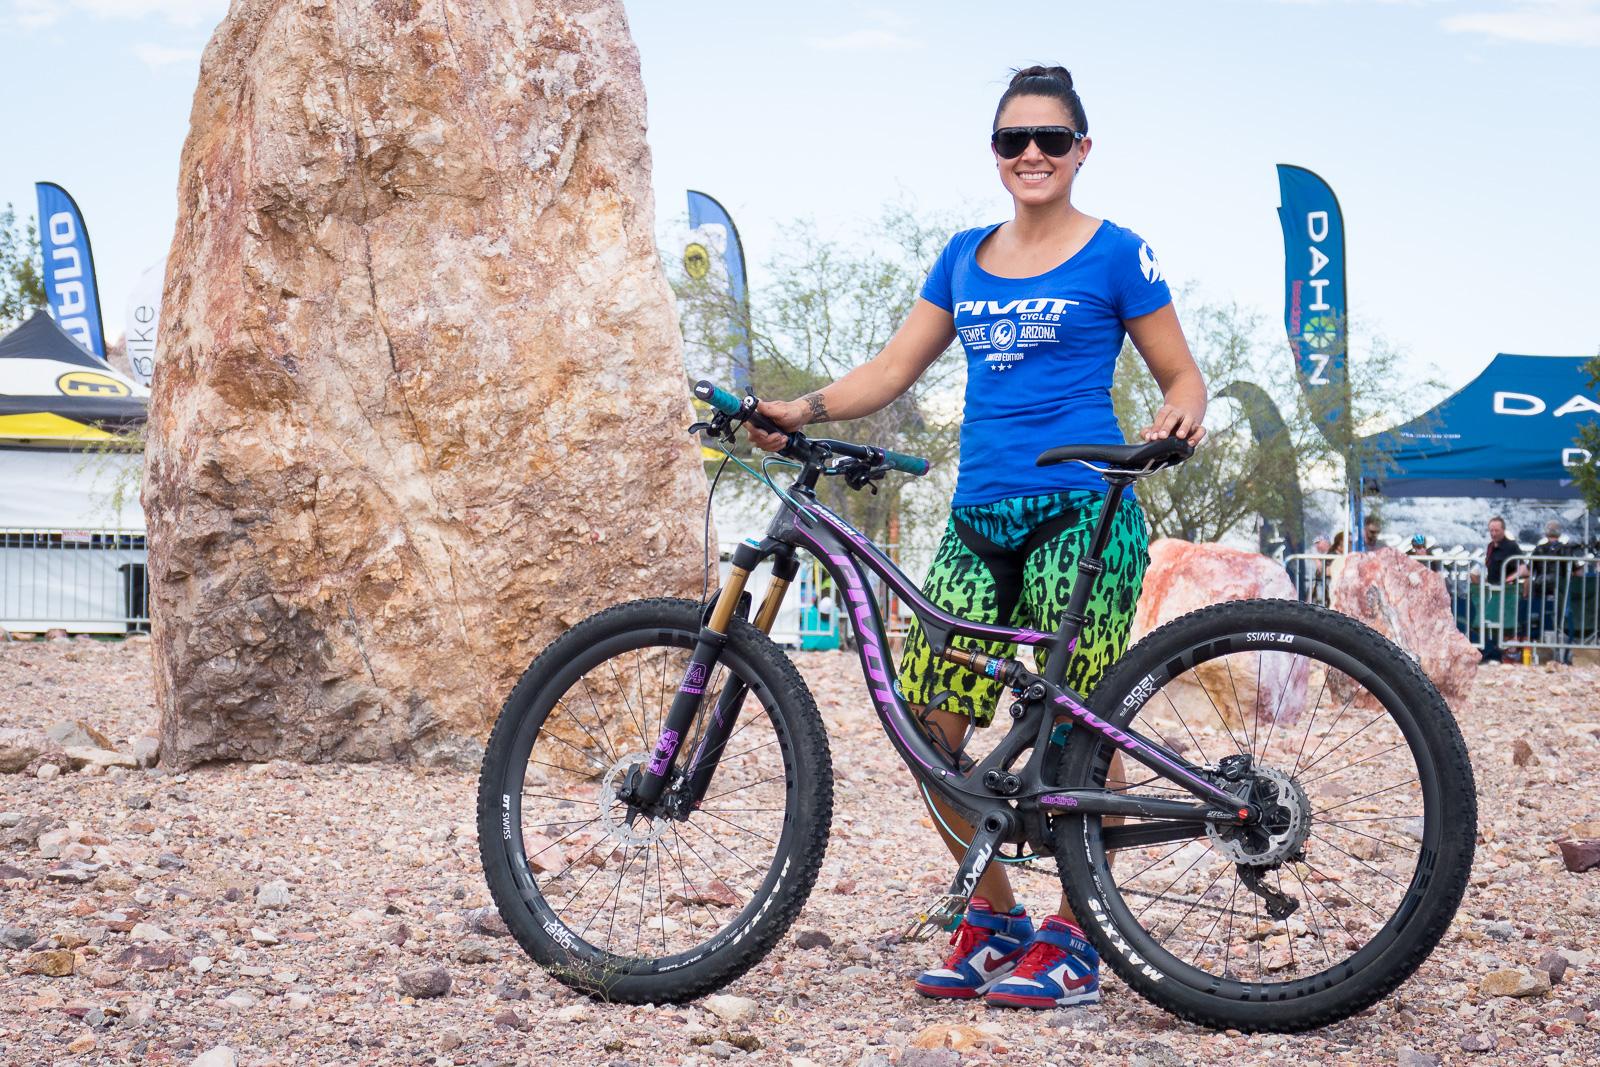 Why are so few women mountain biking?